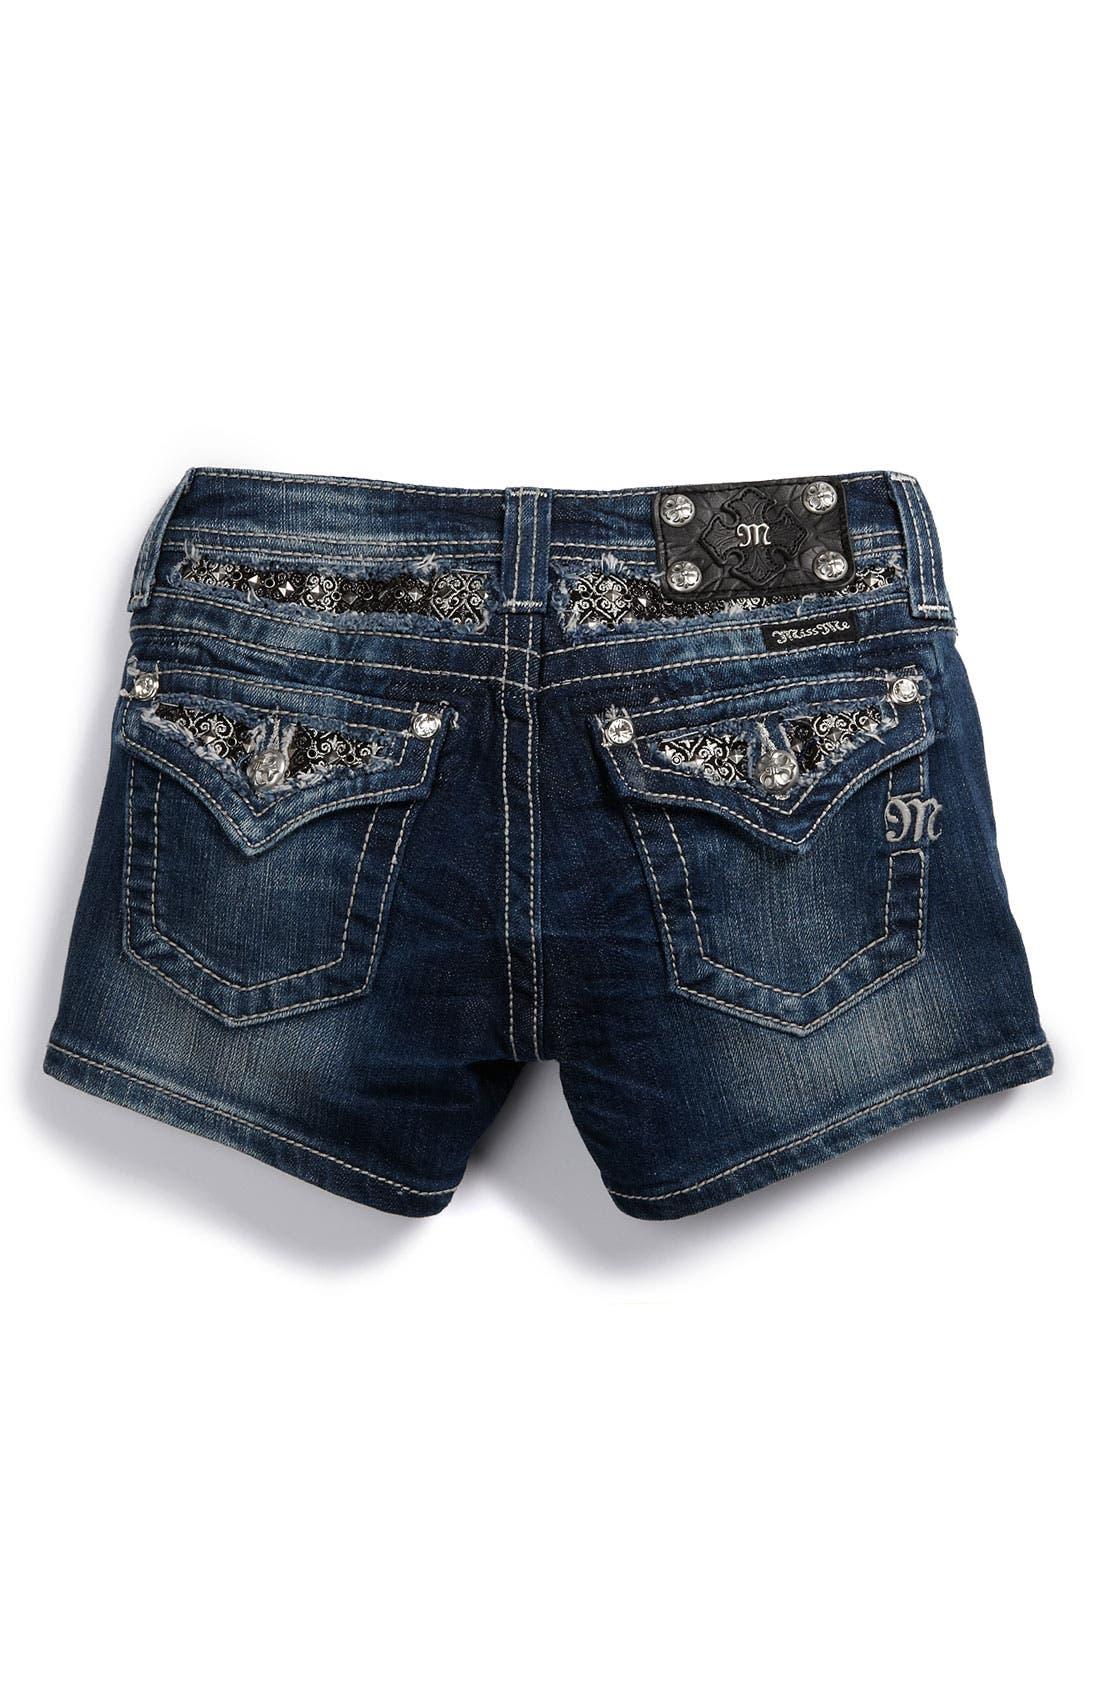 Alternate Image 1 Selected - Miss Me Pointed Flap Pocket Shorts (Big Girls)